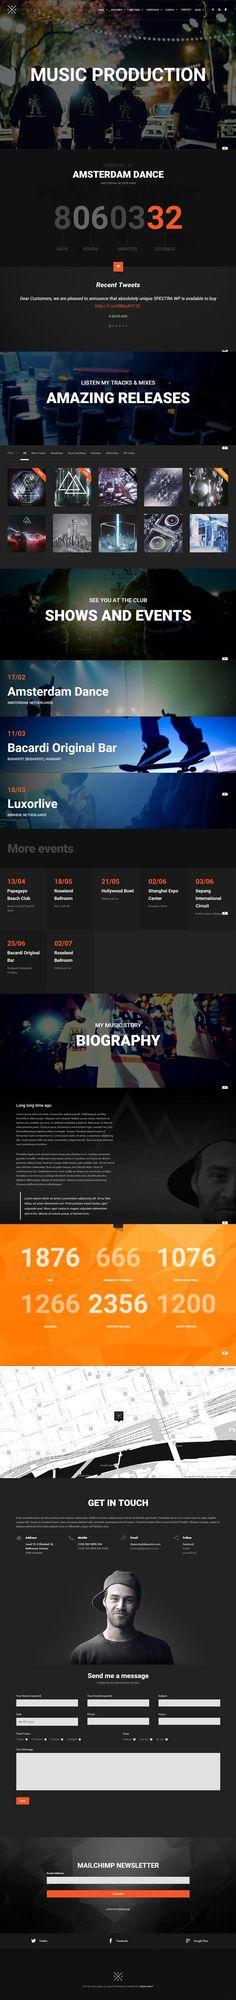 SPECTRA – Responsive Music WordPress Theme #html5wordpressthemes #responsivewordpressthemes #wordpressthemes